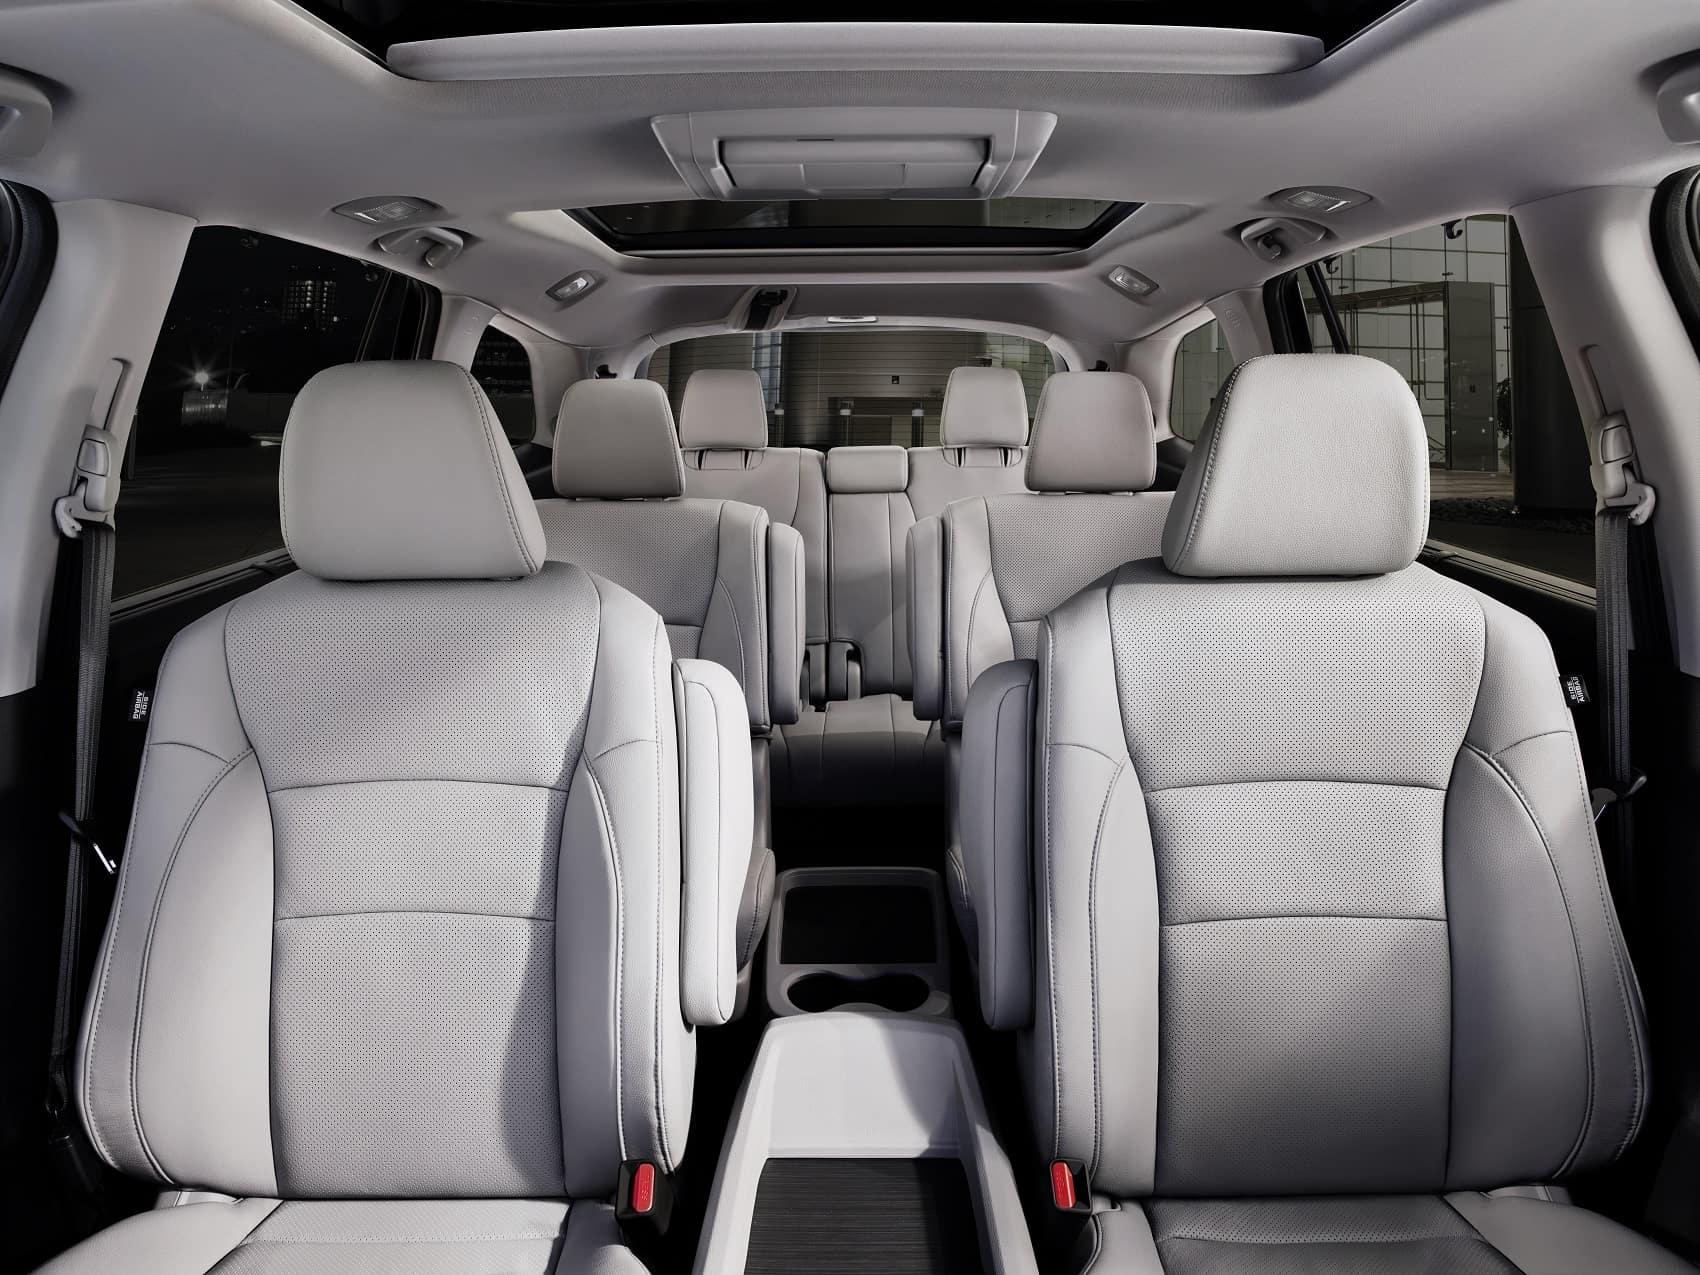 2019 Honda Pilot Interior